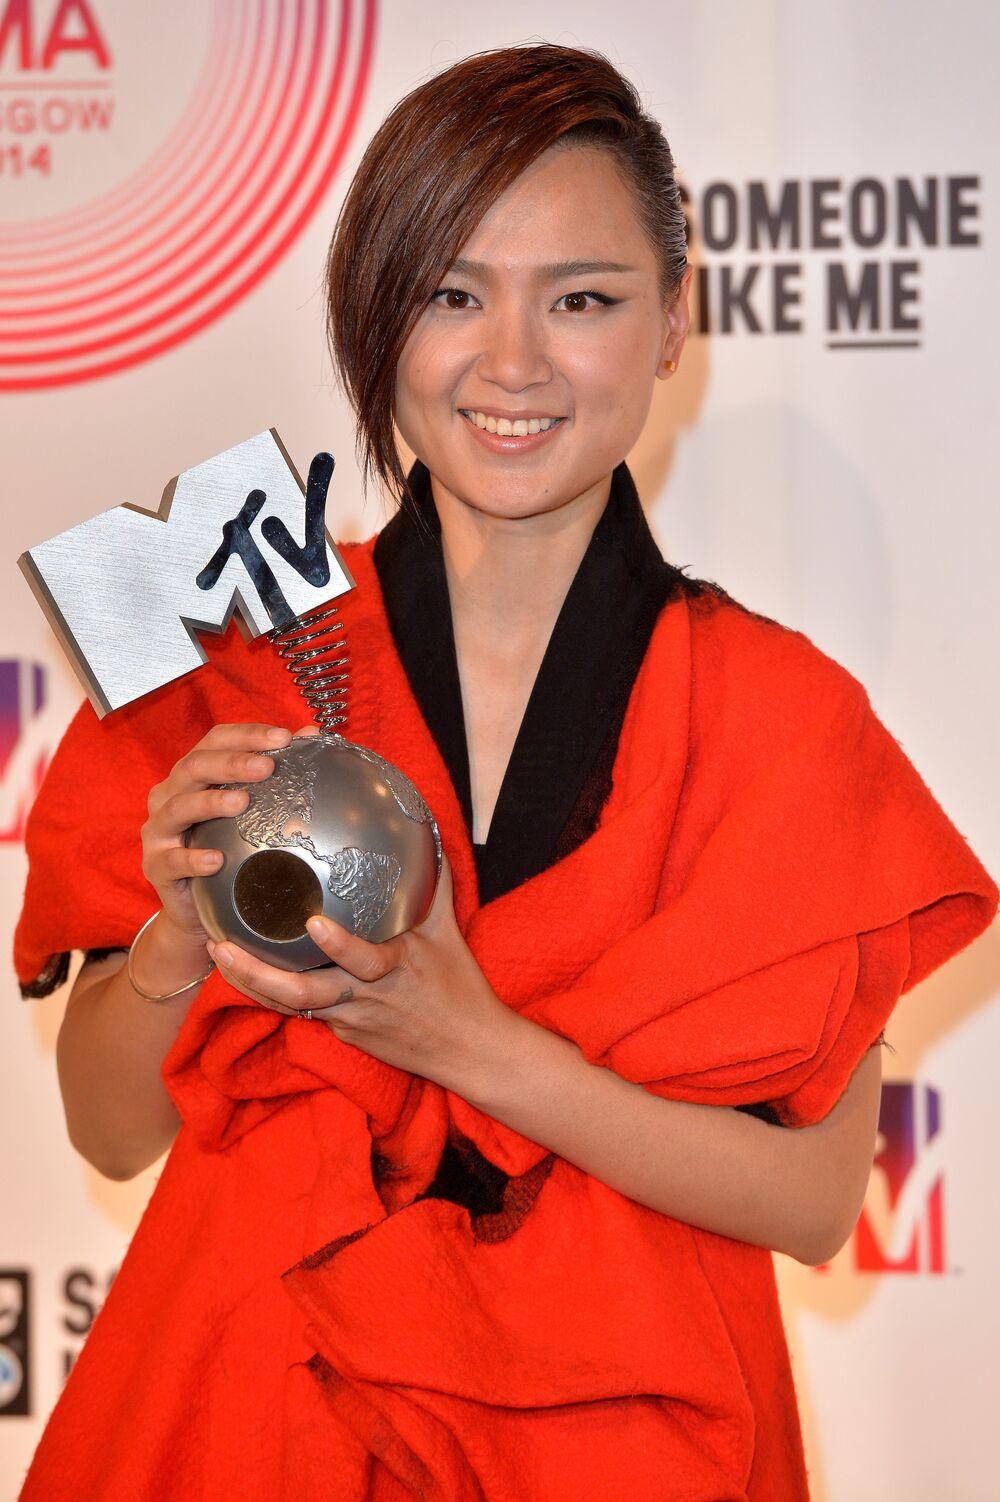 Chinese pop star Bibi Zhou at the ceremony of MTV Europe Music Awards - 2014